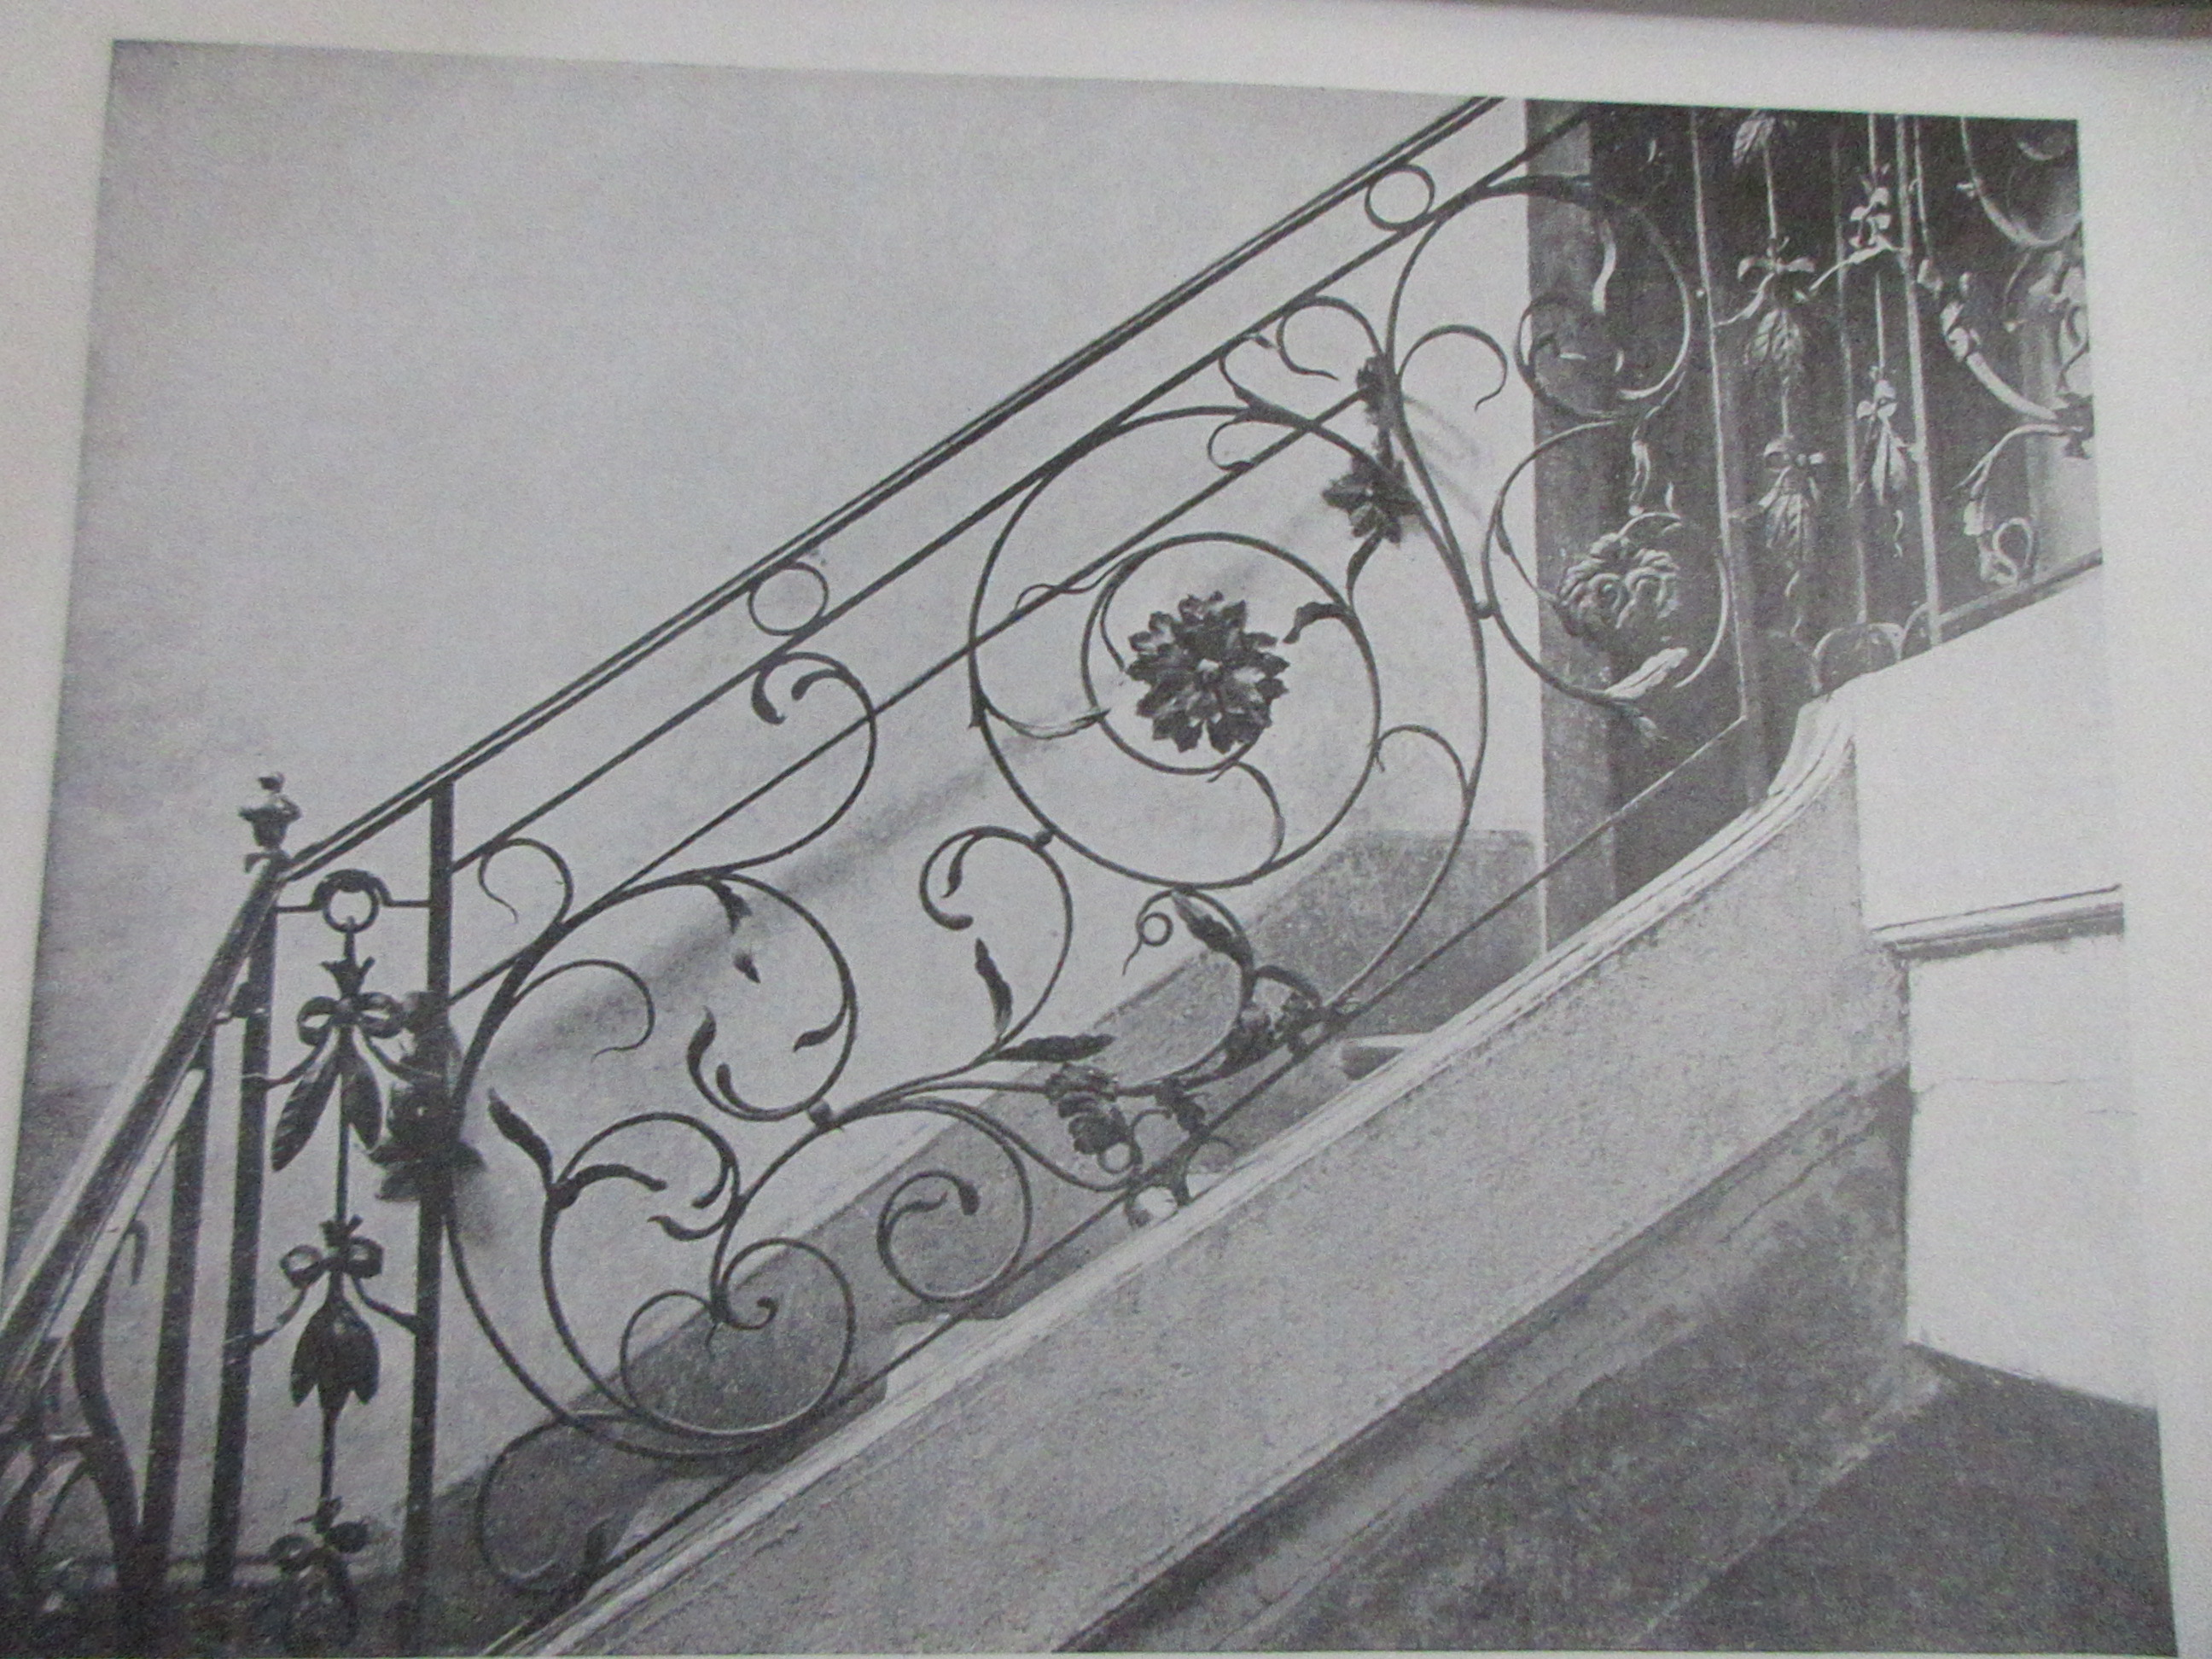 Hench 19 Century Wrought Iron Stair Railing Wrought Iron Balustrade